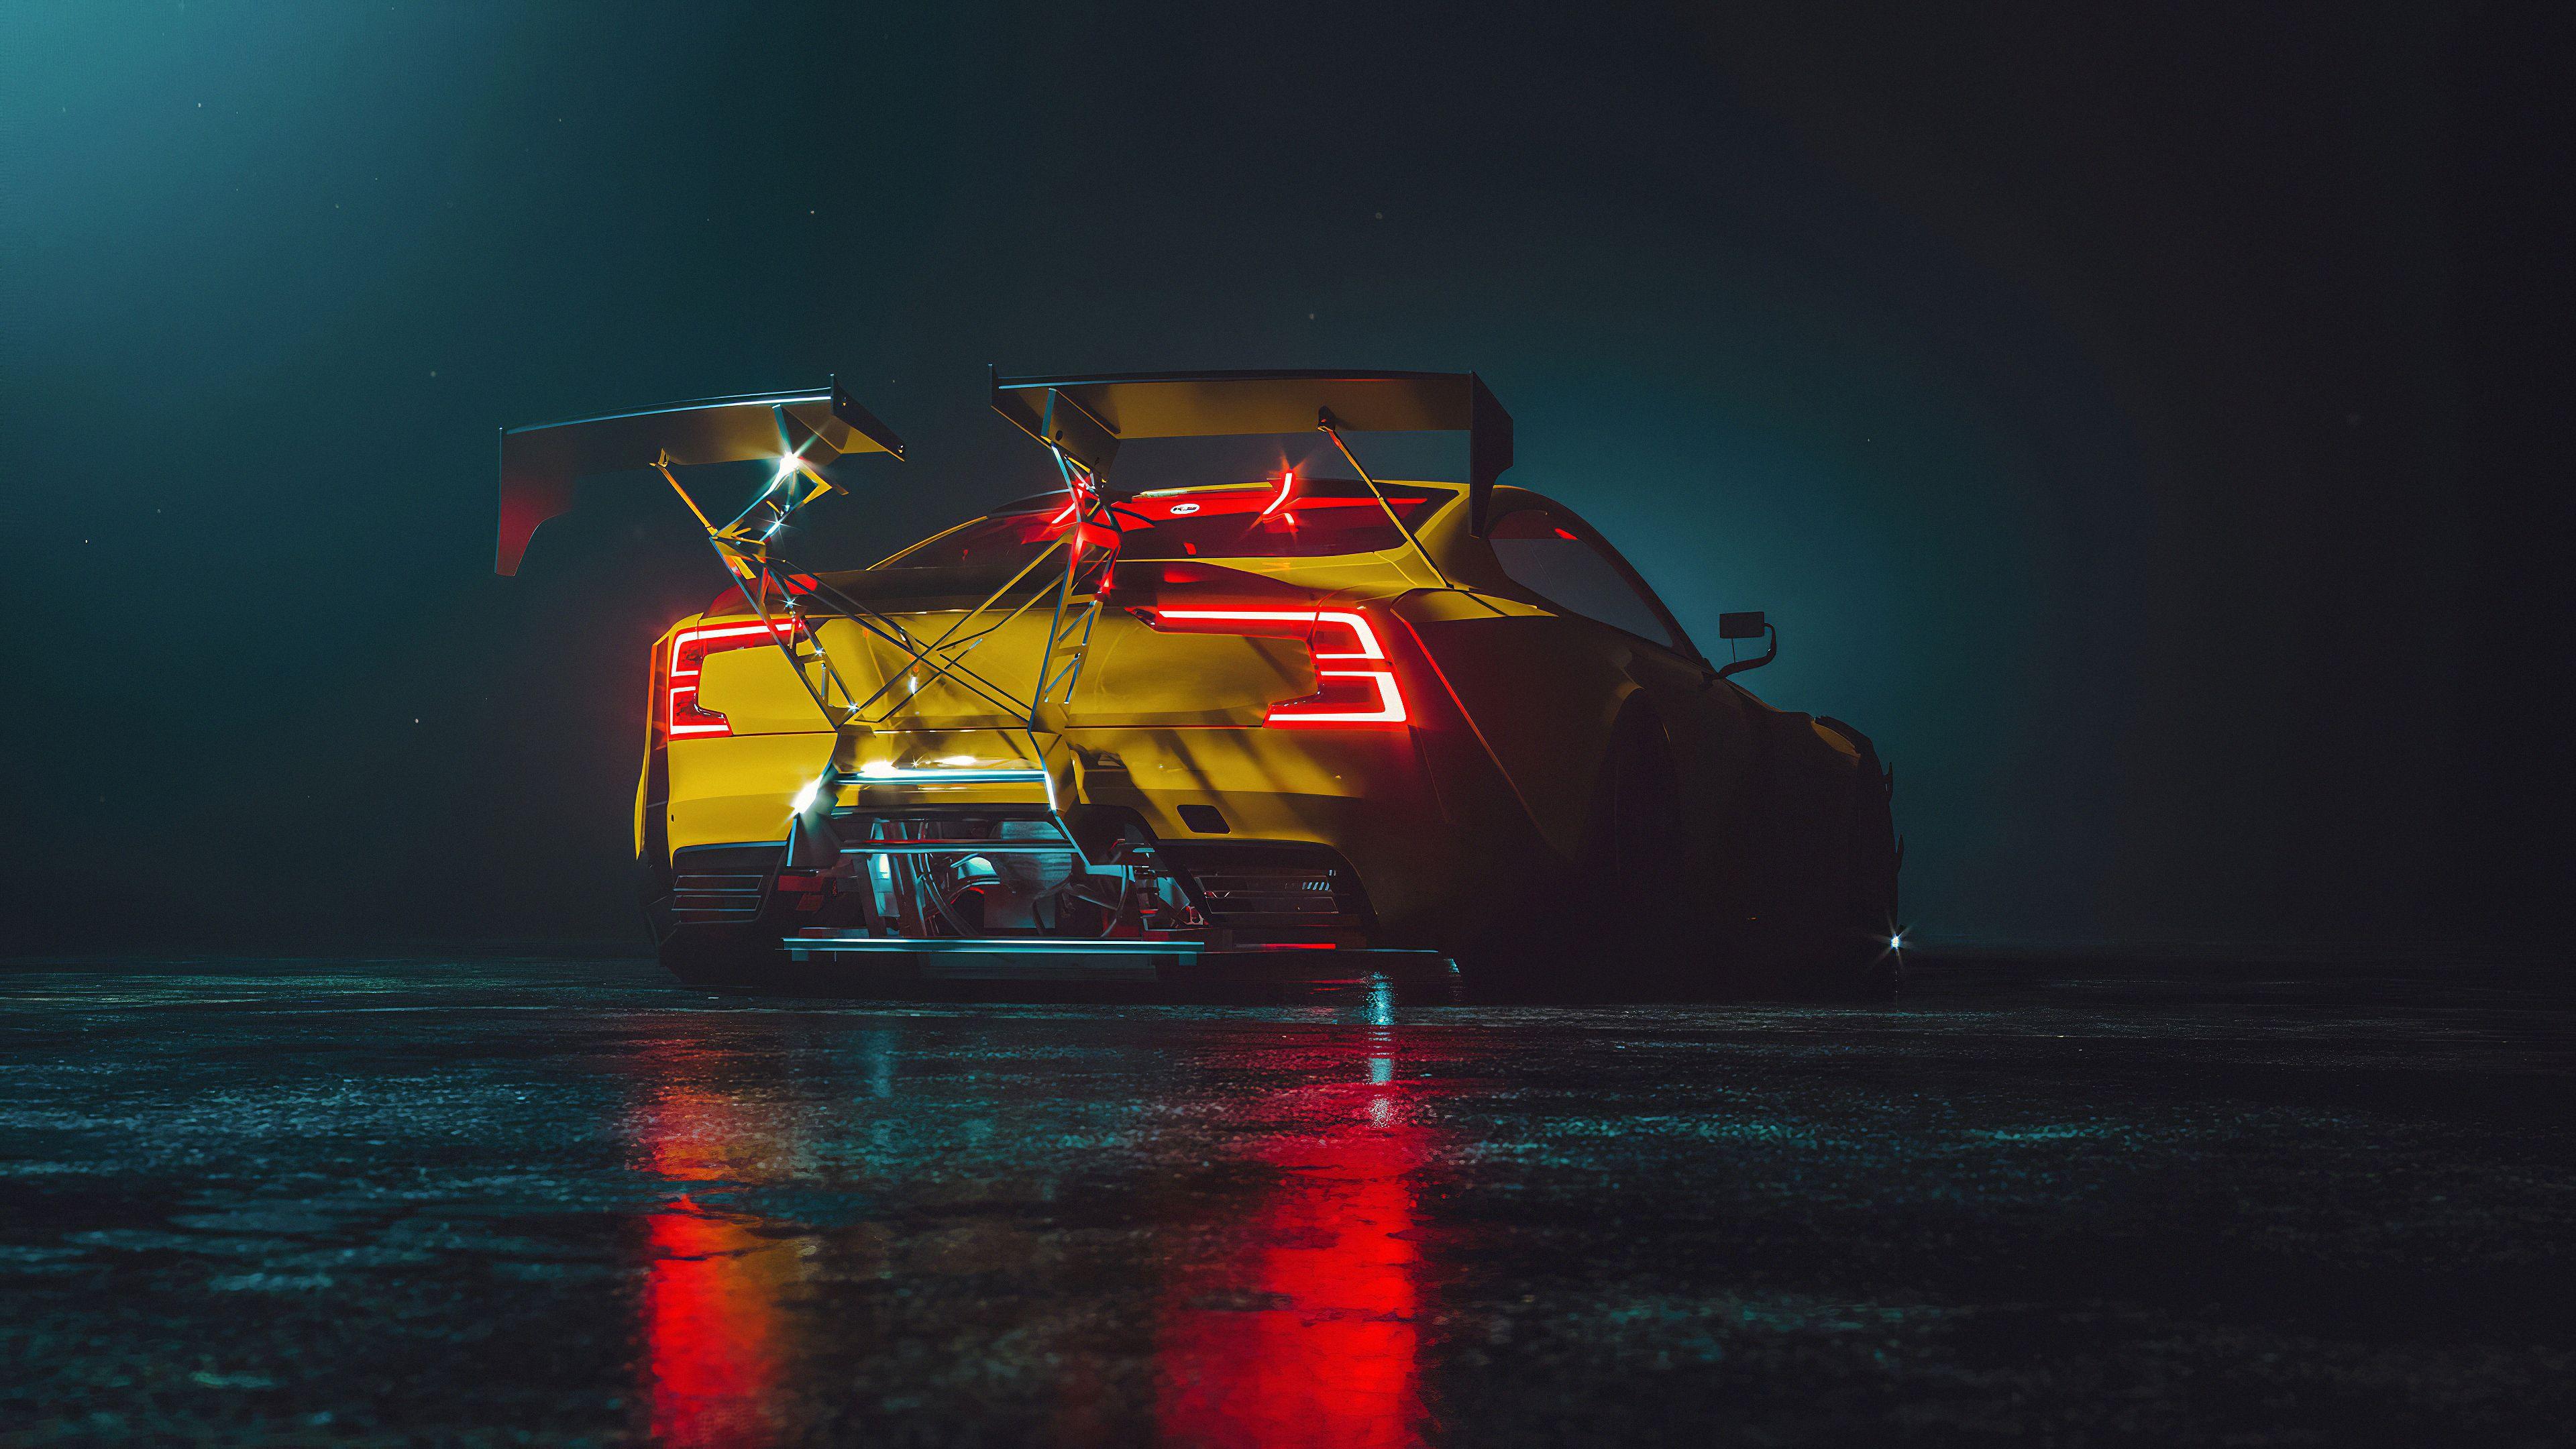 Nfs Heat 2019 Nfs Heat 4k Wallpaper In 2020 Need For Speed Cars Pole Star Car Design